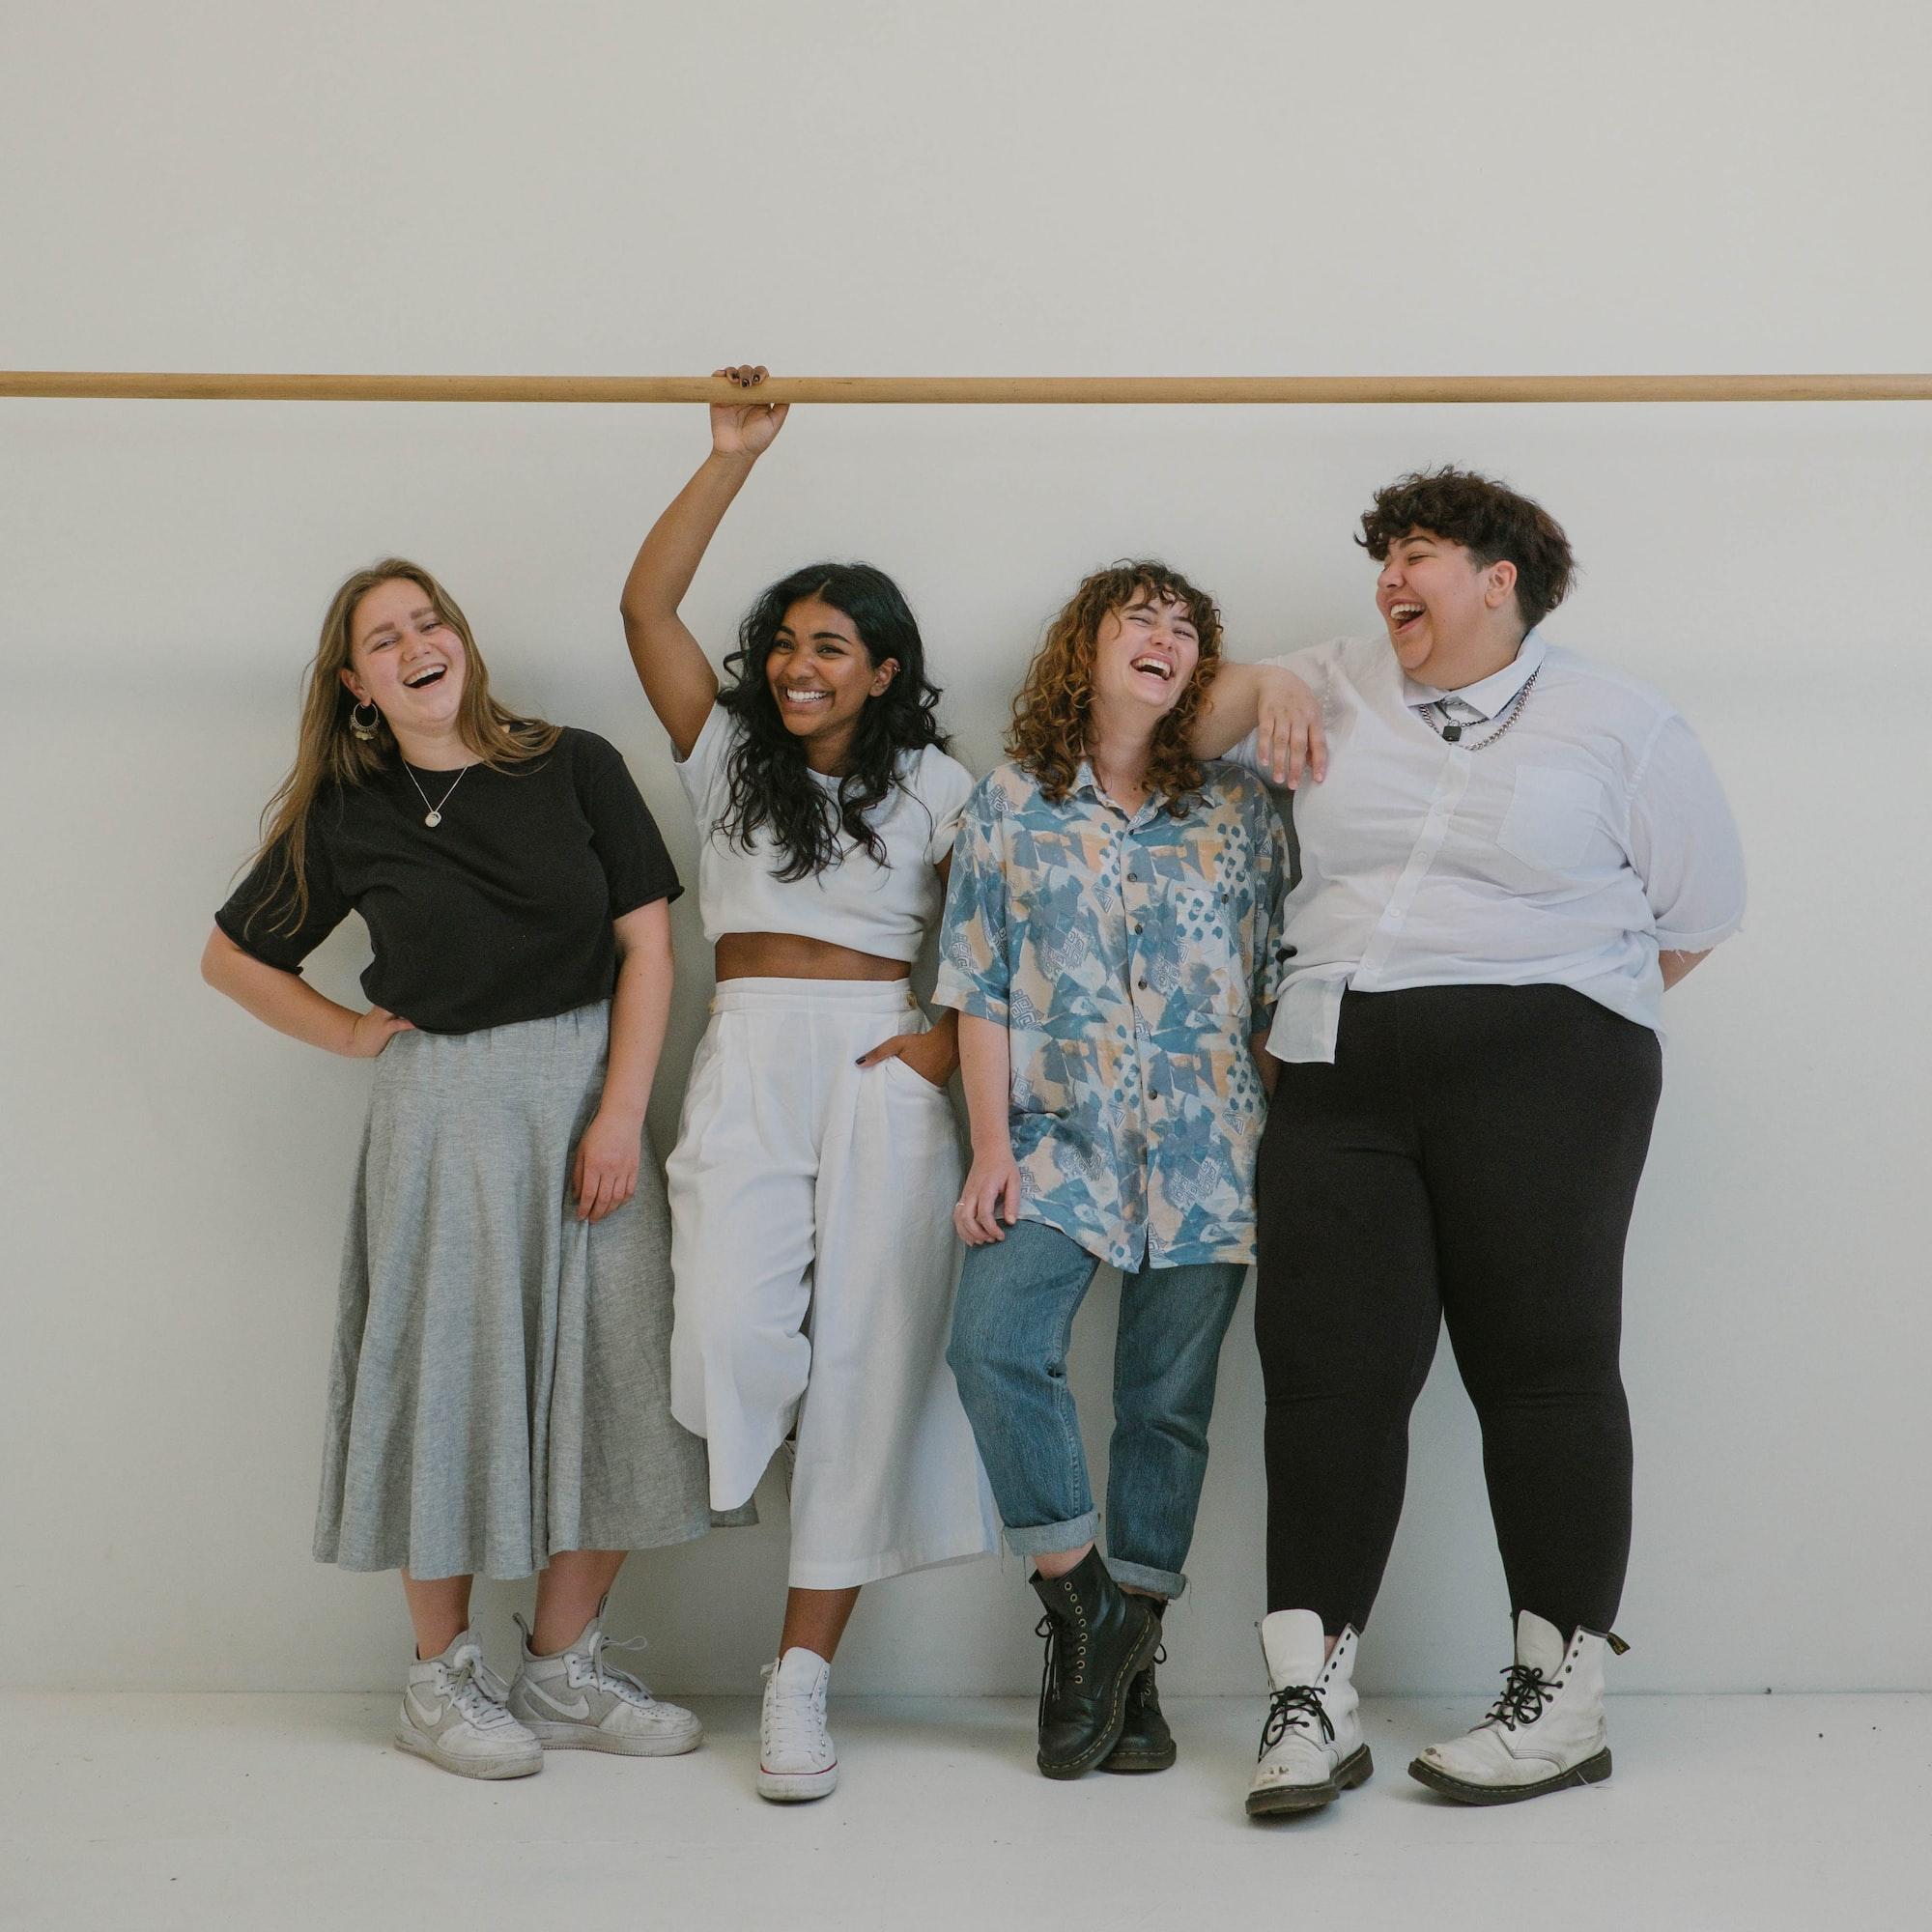 quatro mulheres sorrindo